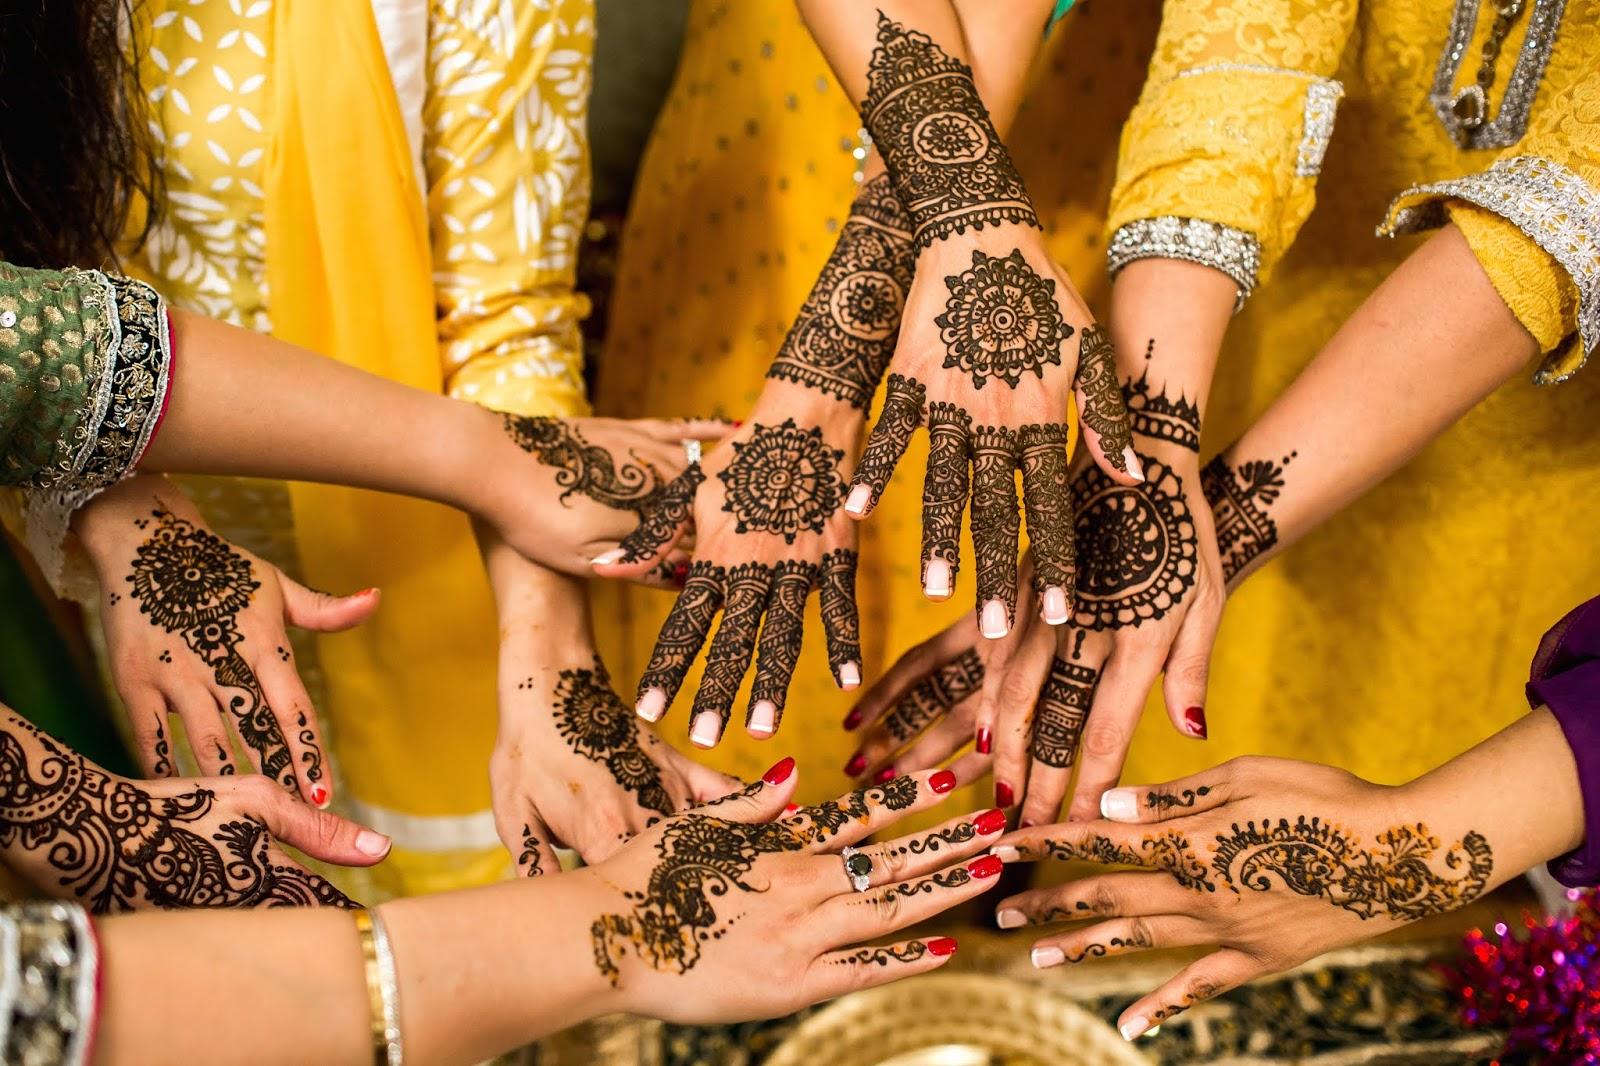 dalici, adivasi, hinduizm, hijra, opium dla ludu, mas, religia i rasizm, system kastowy, warna